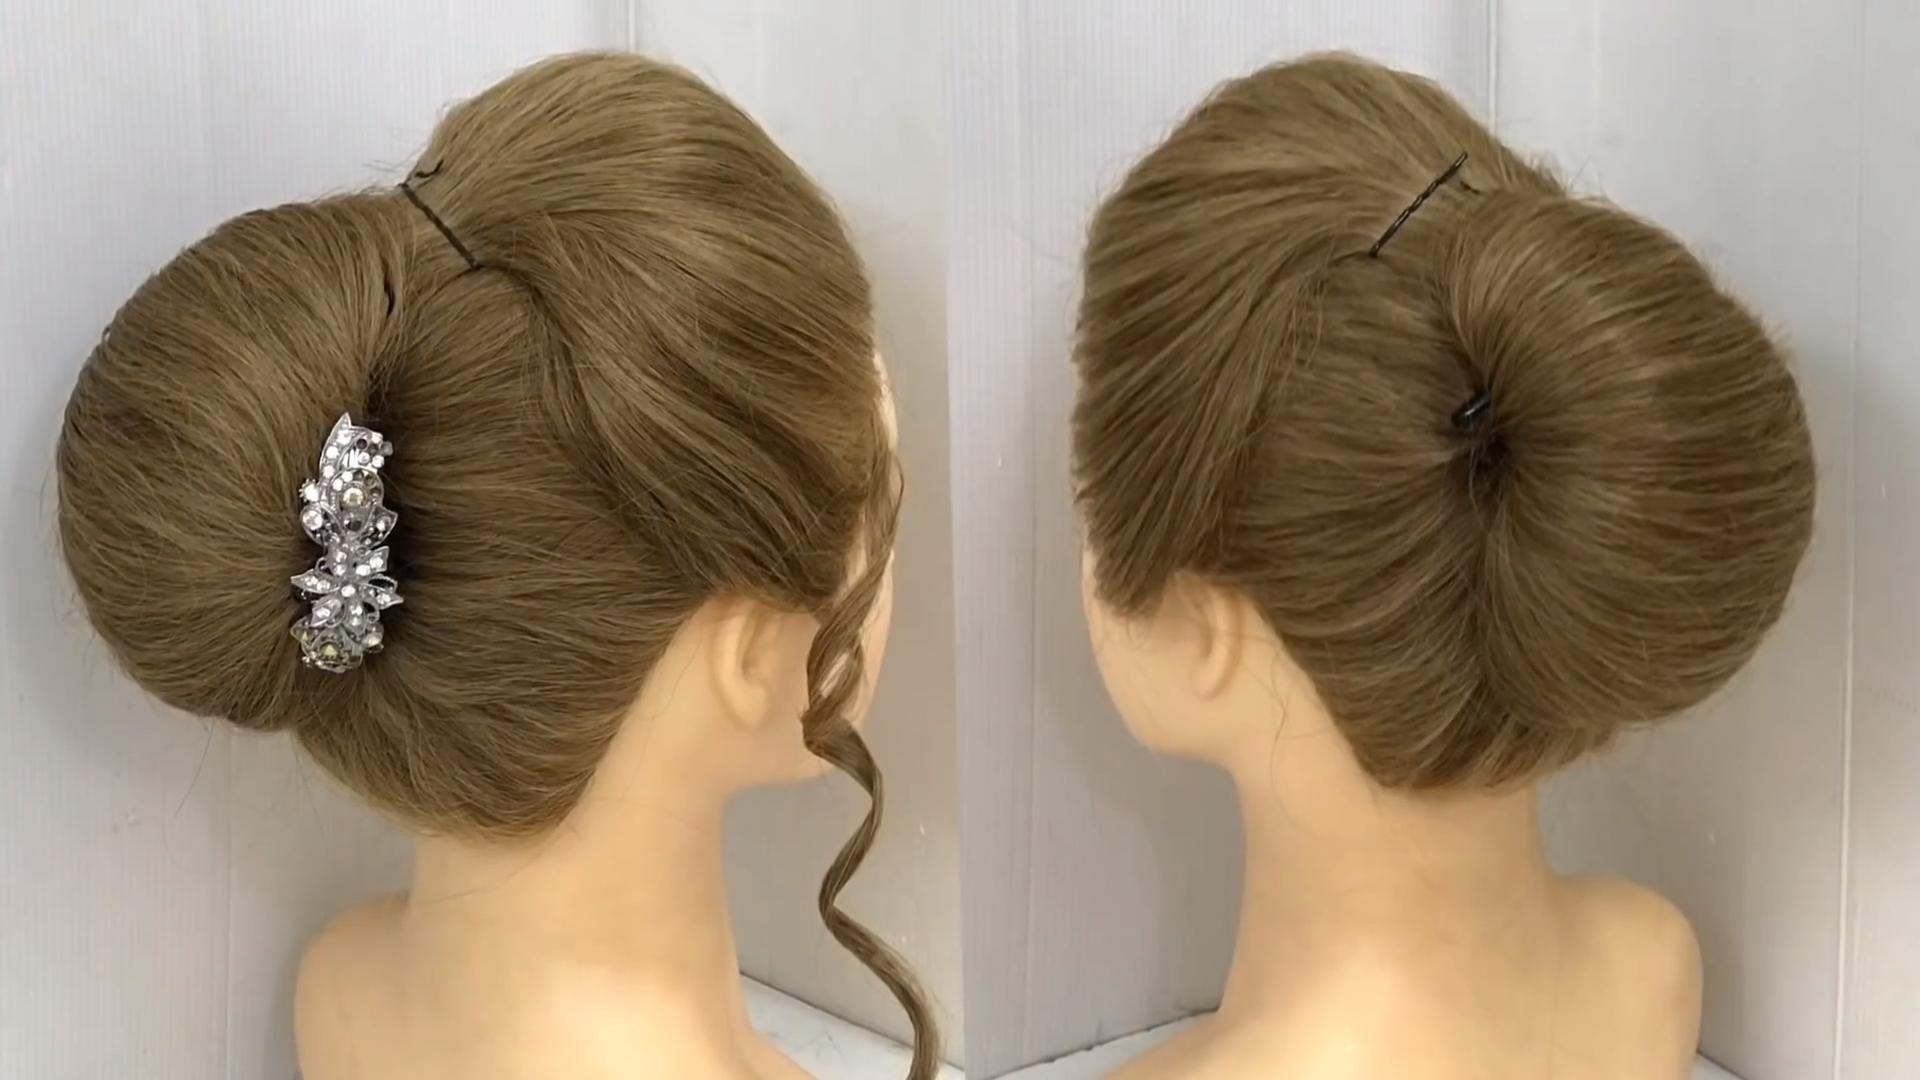 Simple Hairstyles For Short Hair For College Beste Frisuren Easy Hairstyles Hair Tutorials For Medium Hair Bun Hairstyles